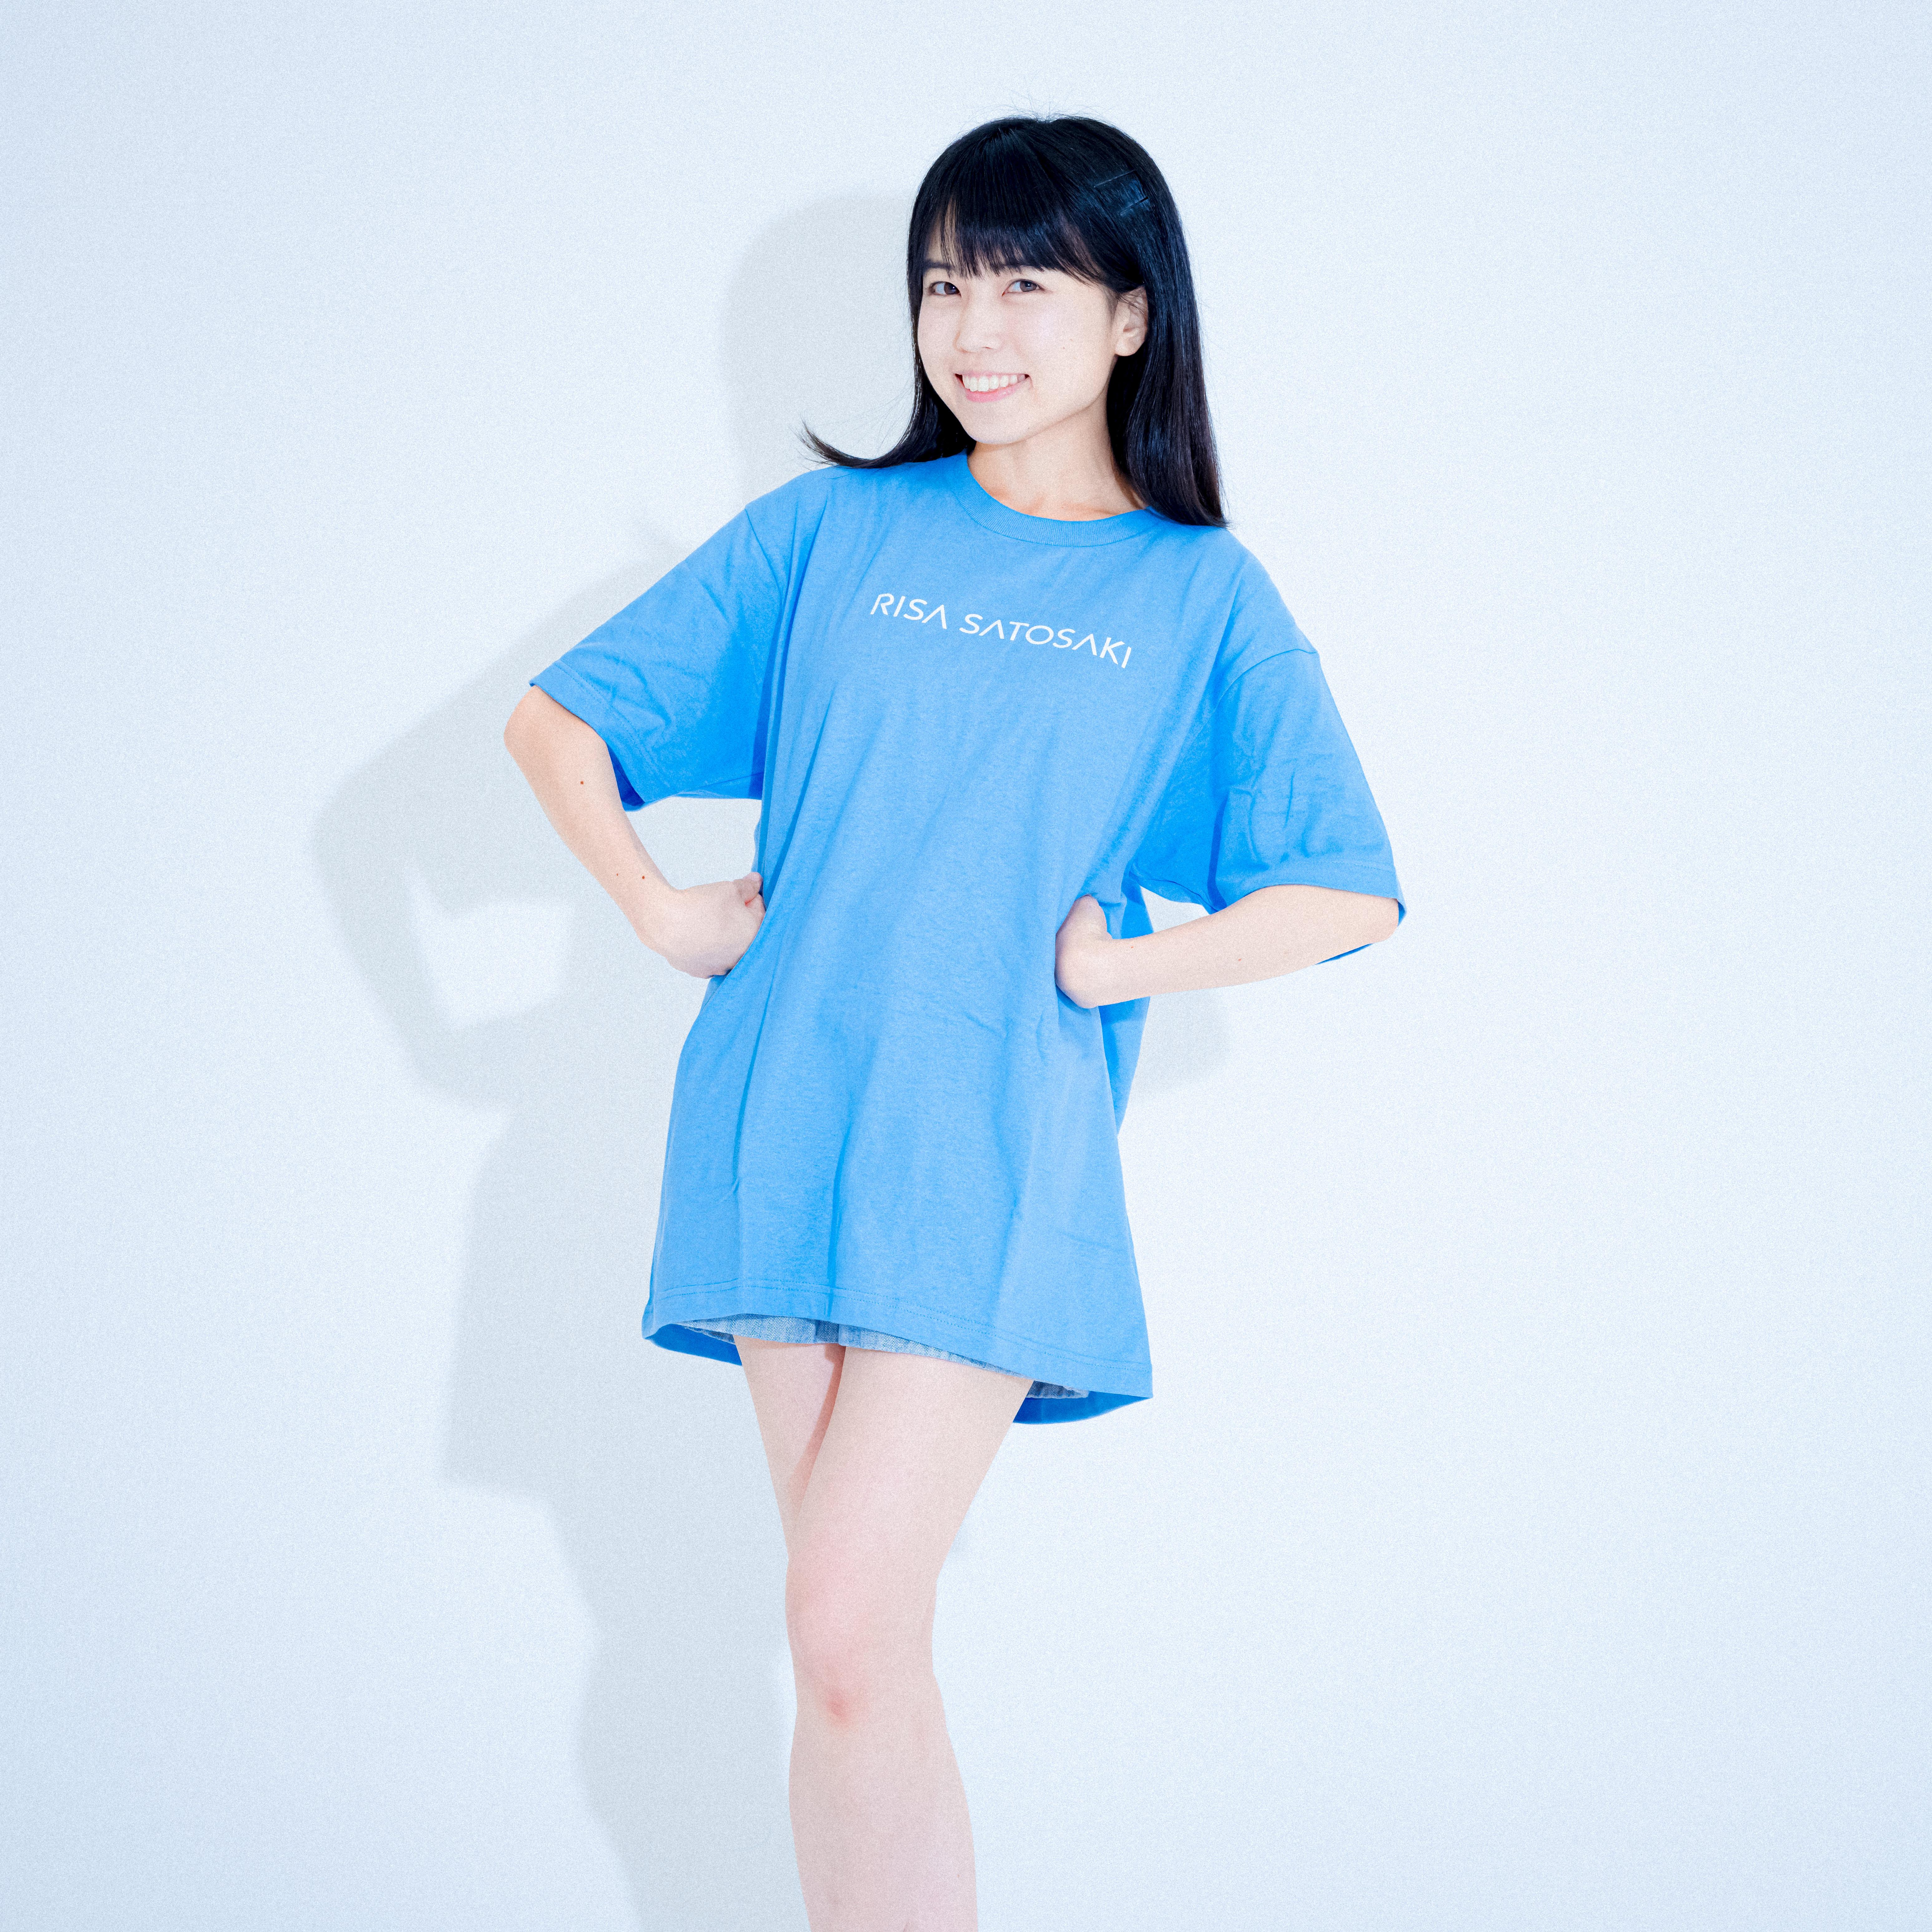 【Tシャツ】Risa Satosaki LogoT